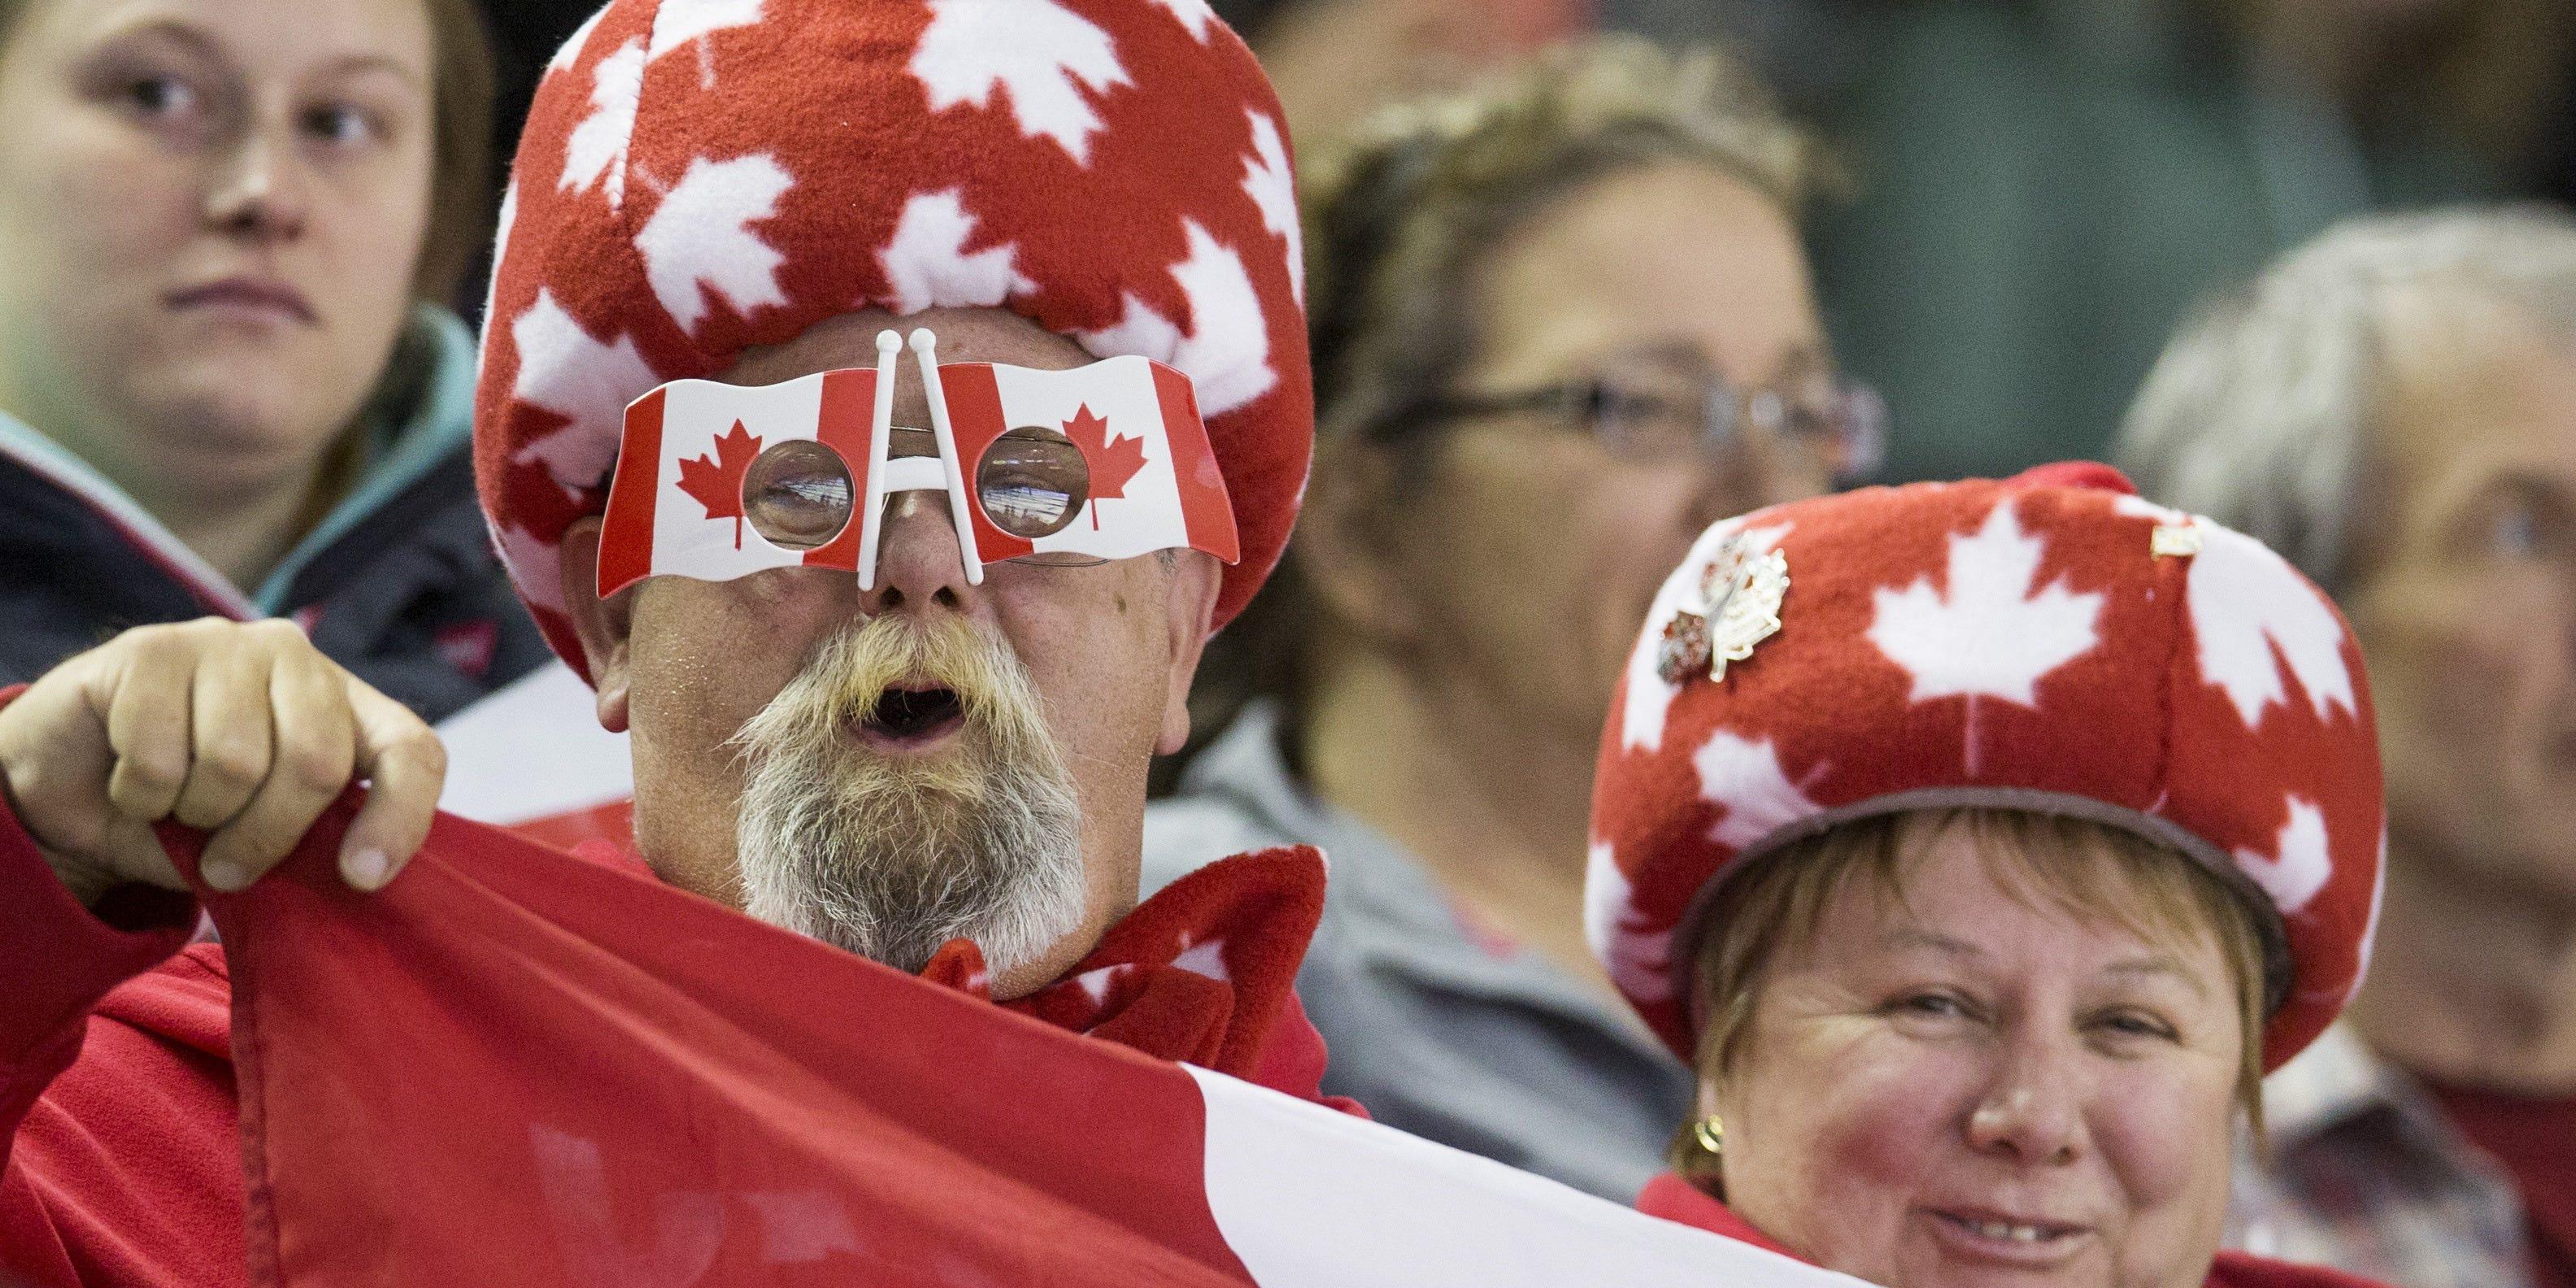 Canada has a 'Rhinoceros Party' - Business Insider